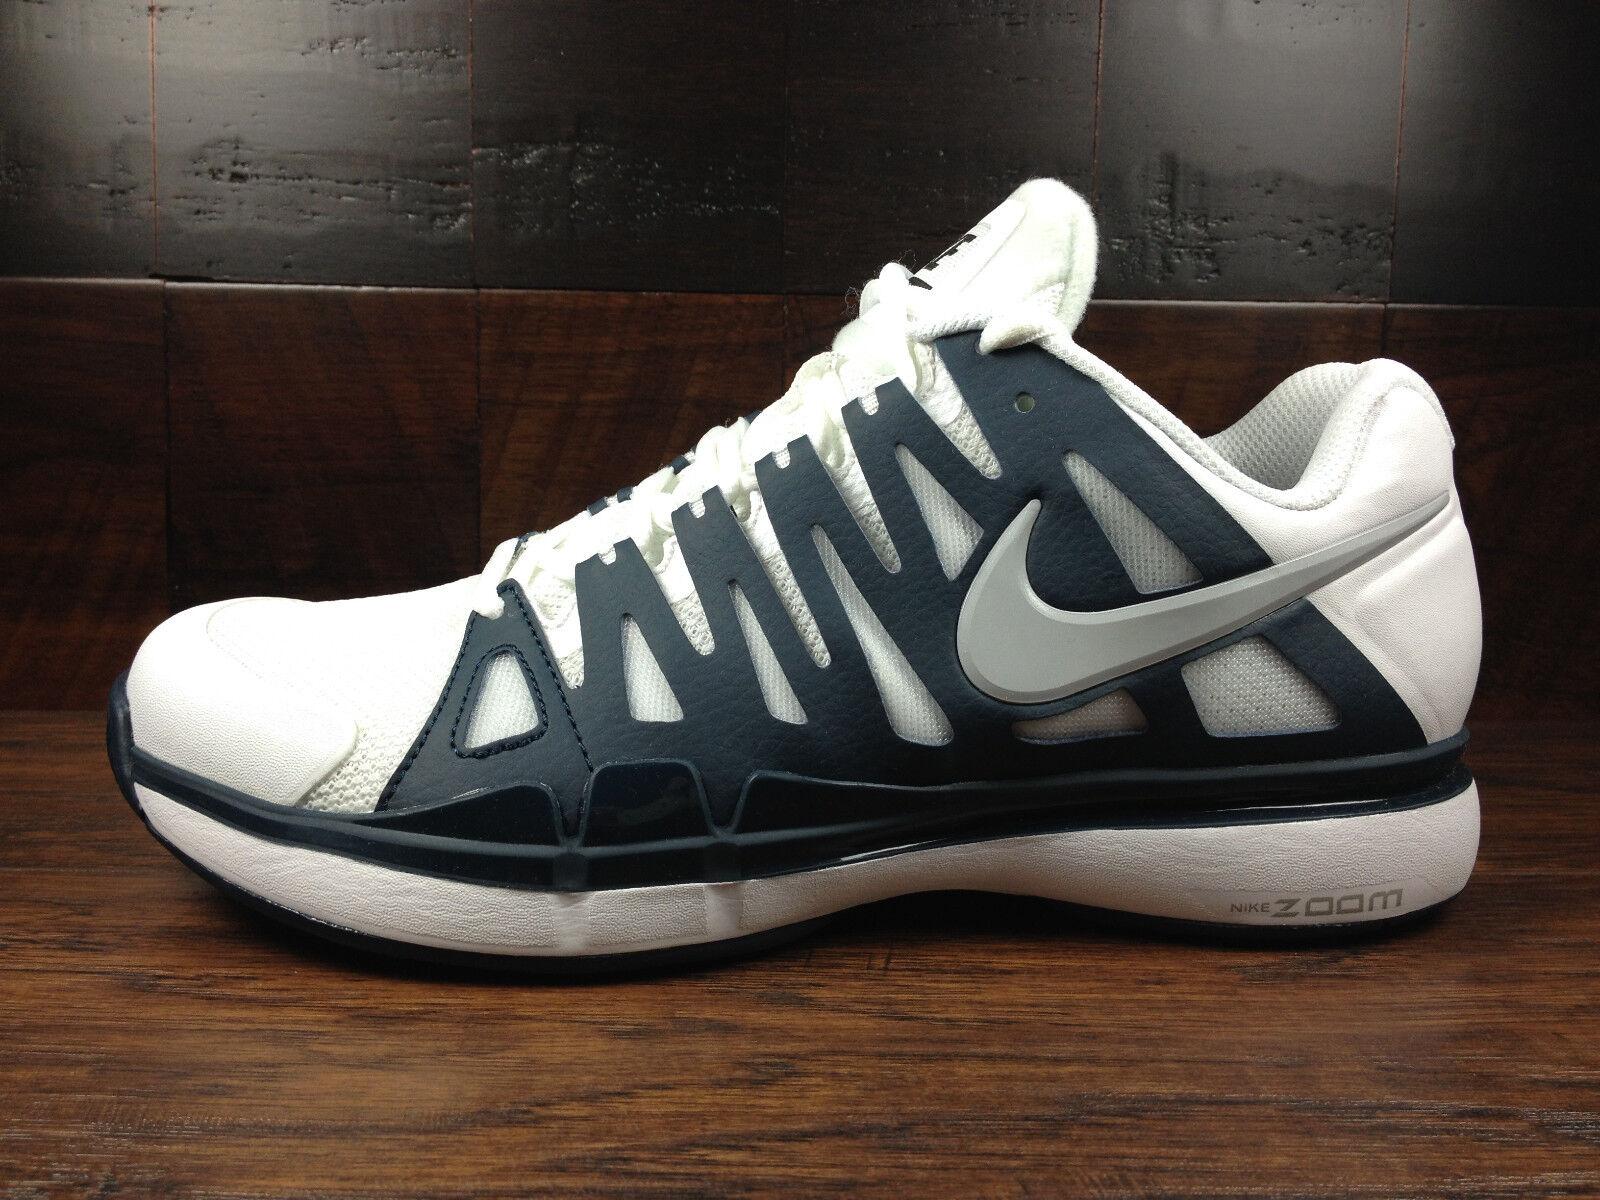 Nike Zoom Vapor 9 Tour (Blanc / Navy Bleu) Federer Tennis [488000-104] Homme 7.5